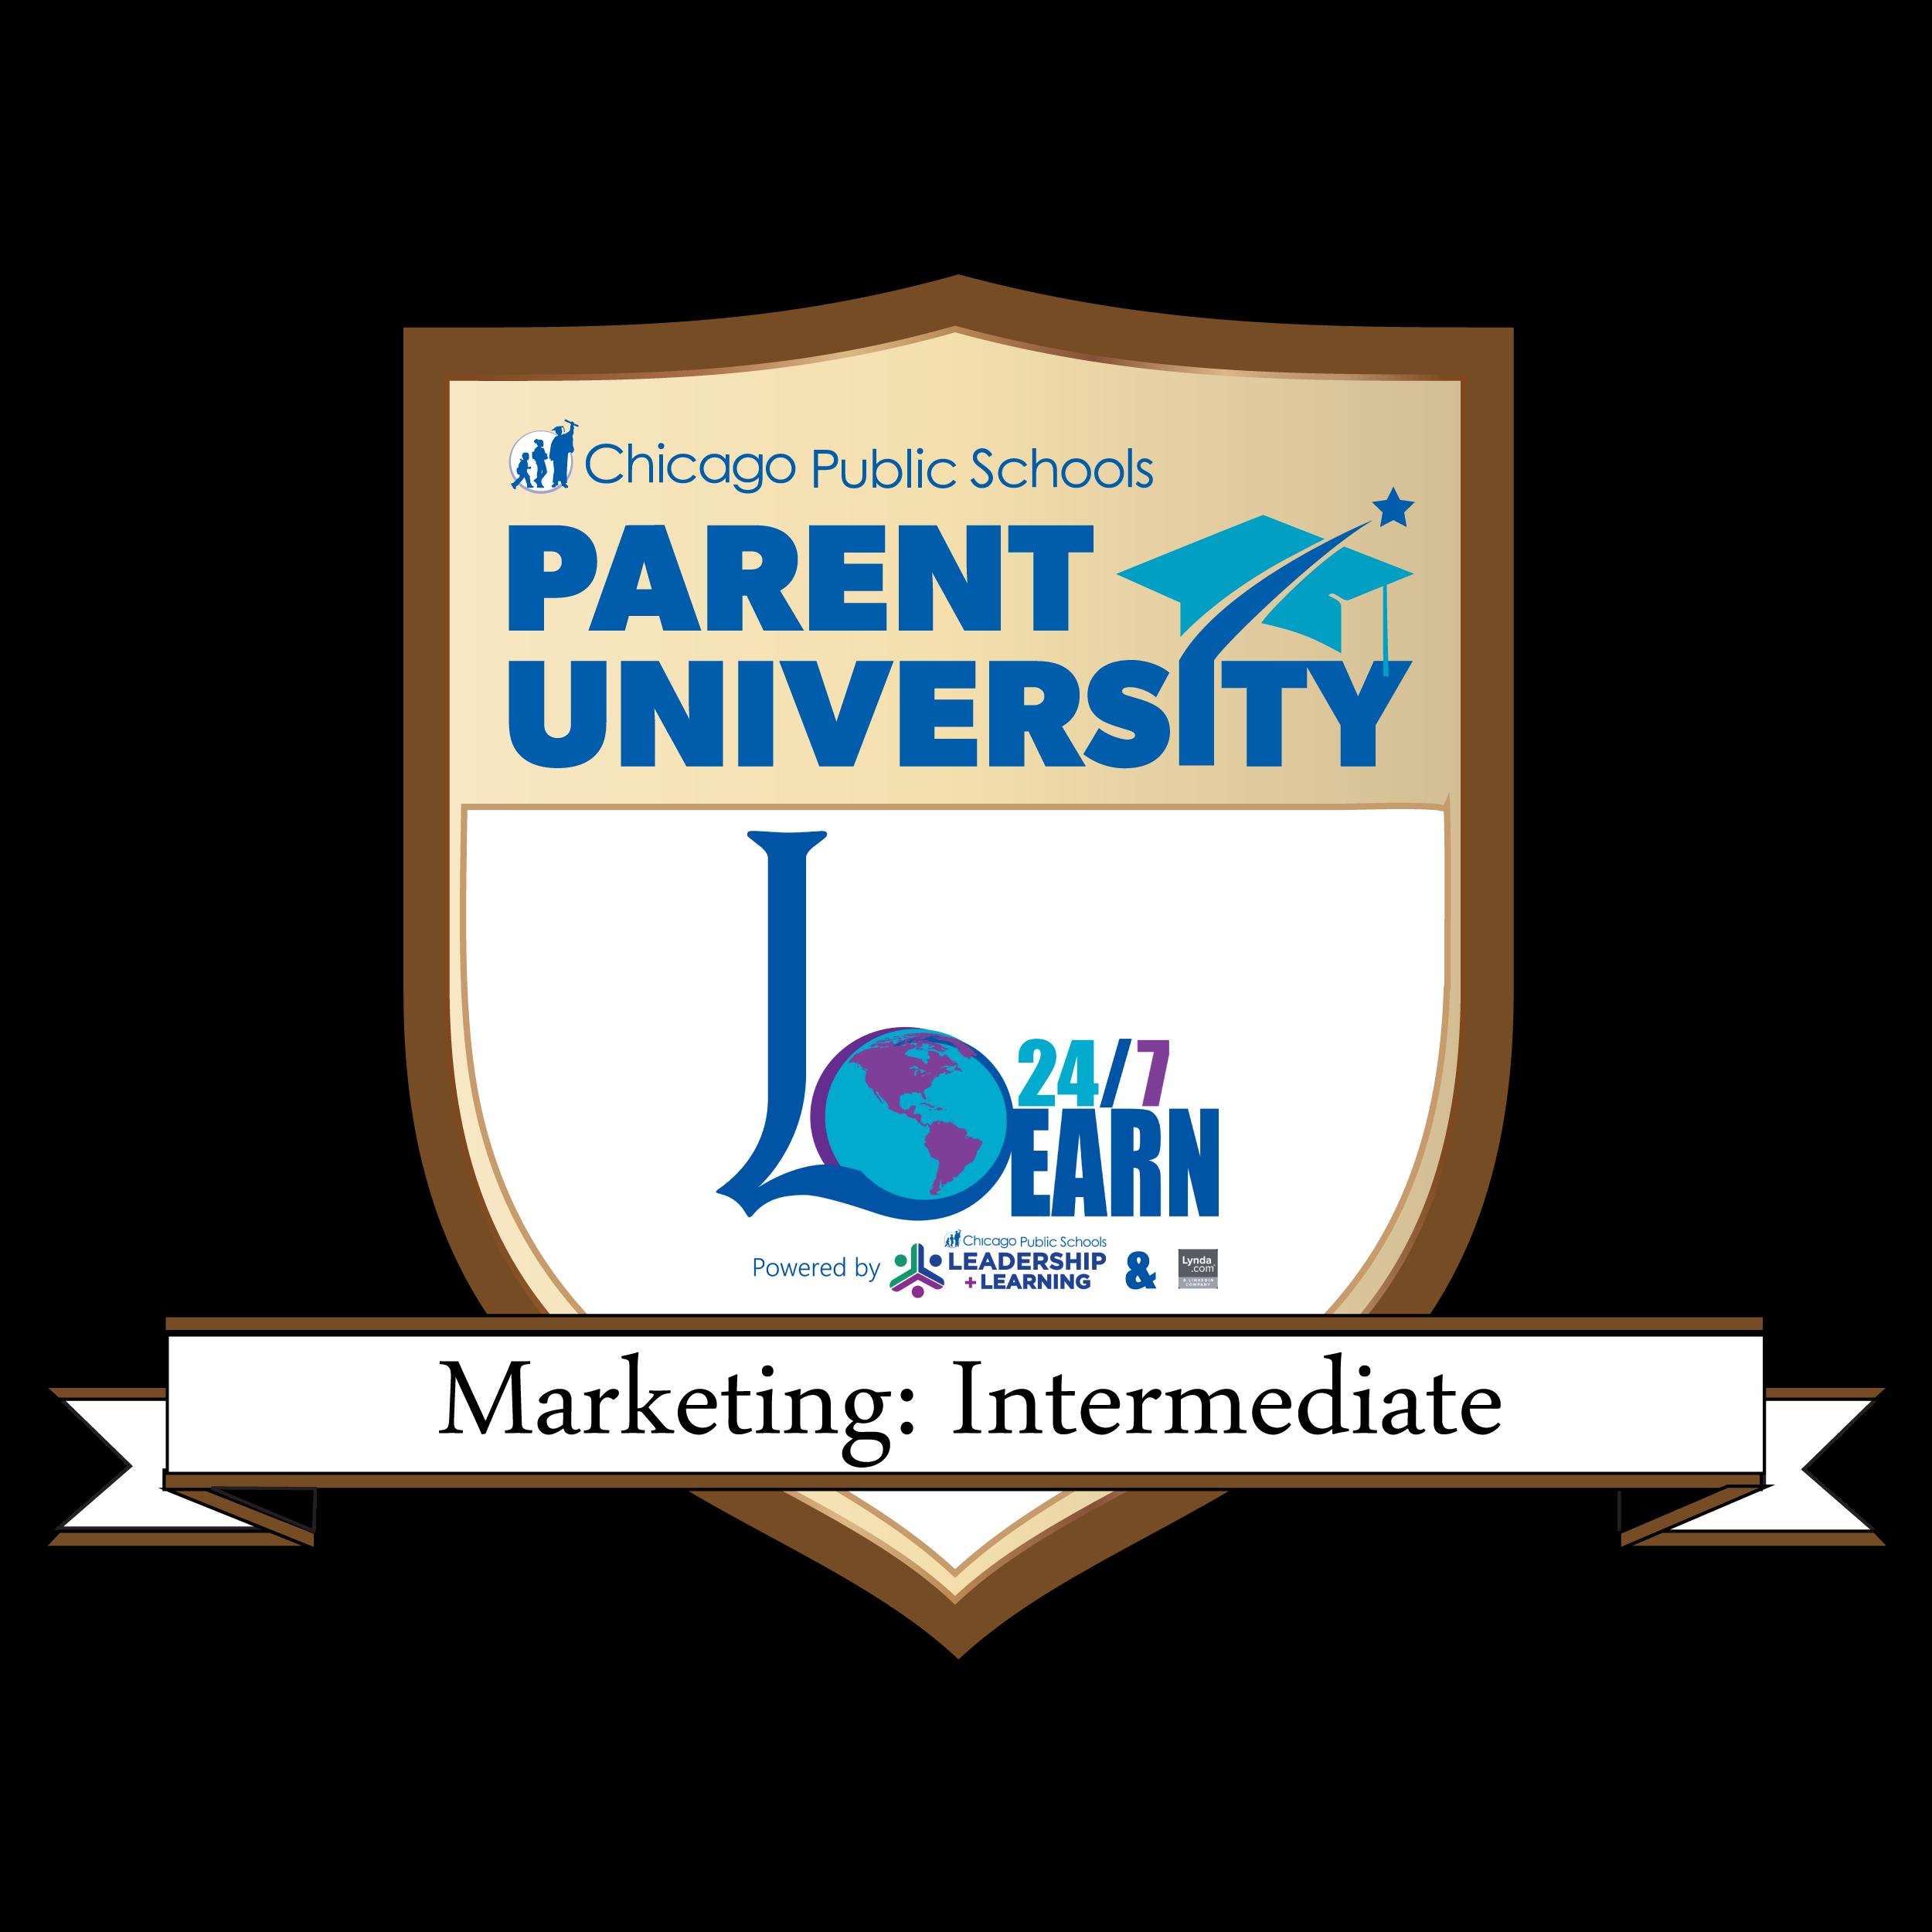 Marketing: Intermediate